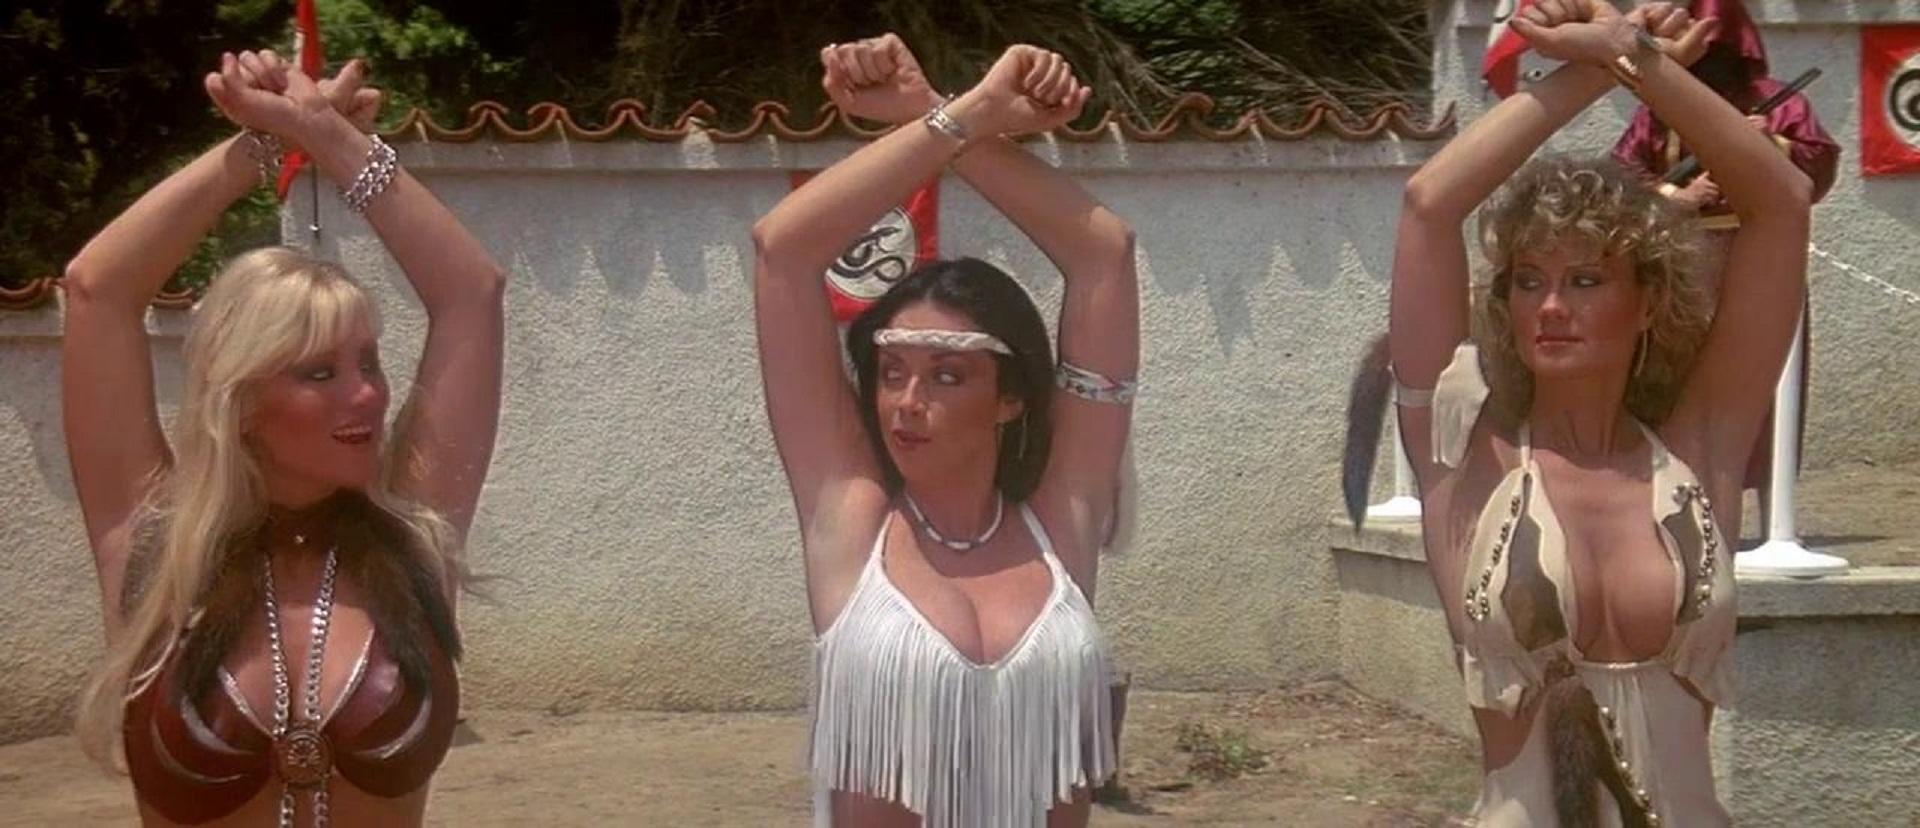 Angelique Pettyjohn Topless the lost empire (1983) - moria